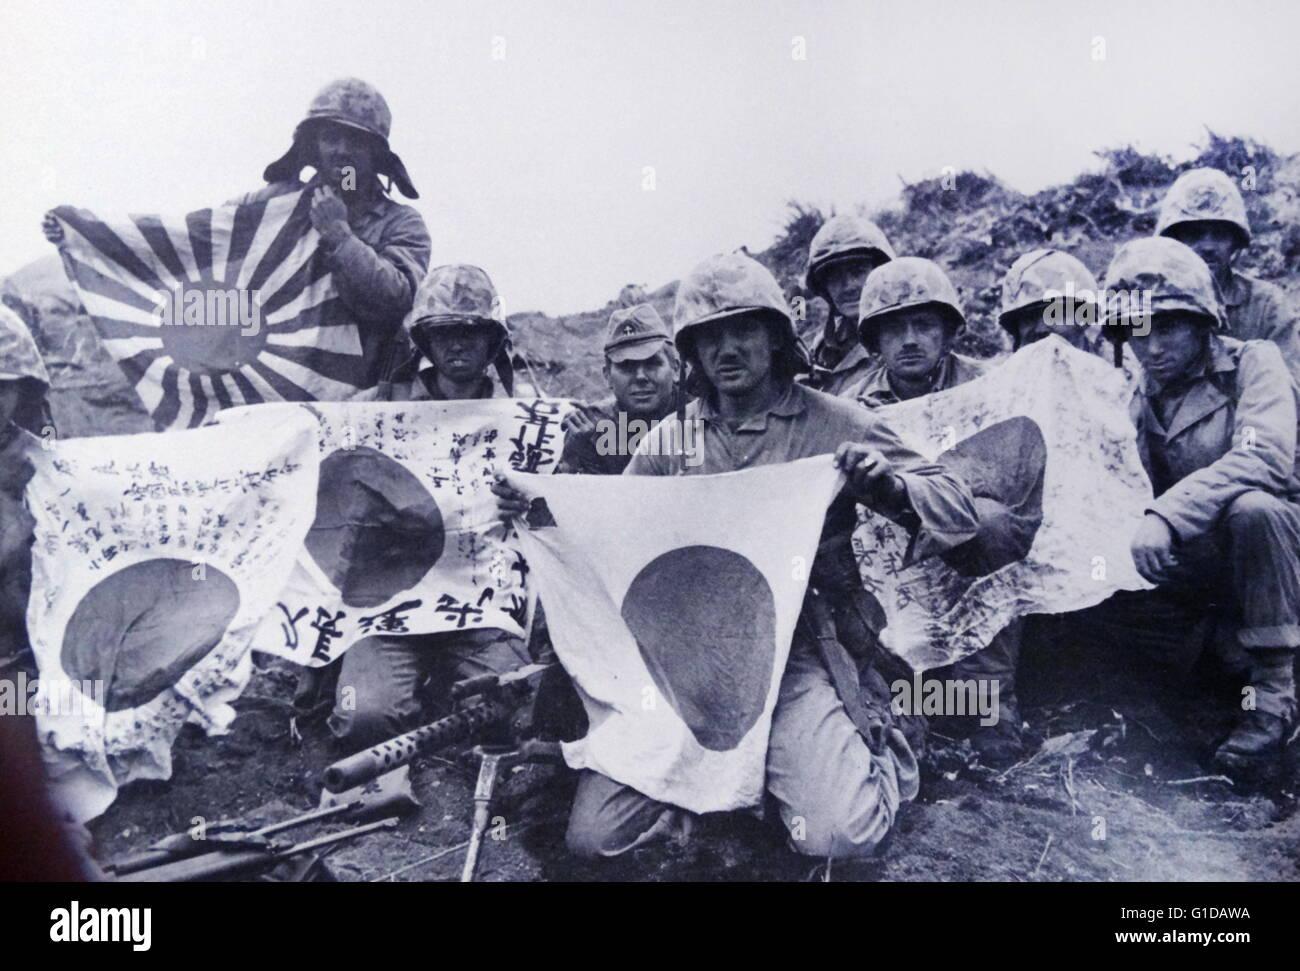 Marines exhibit Japanese flags. - Stock Image